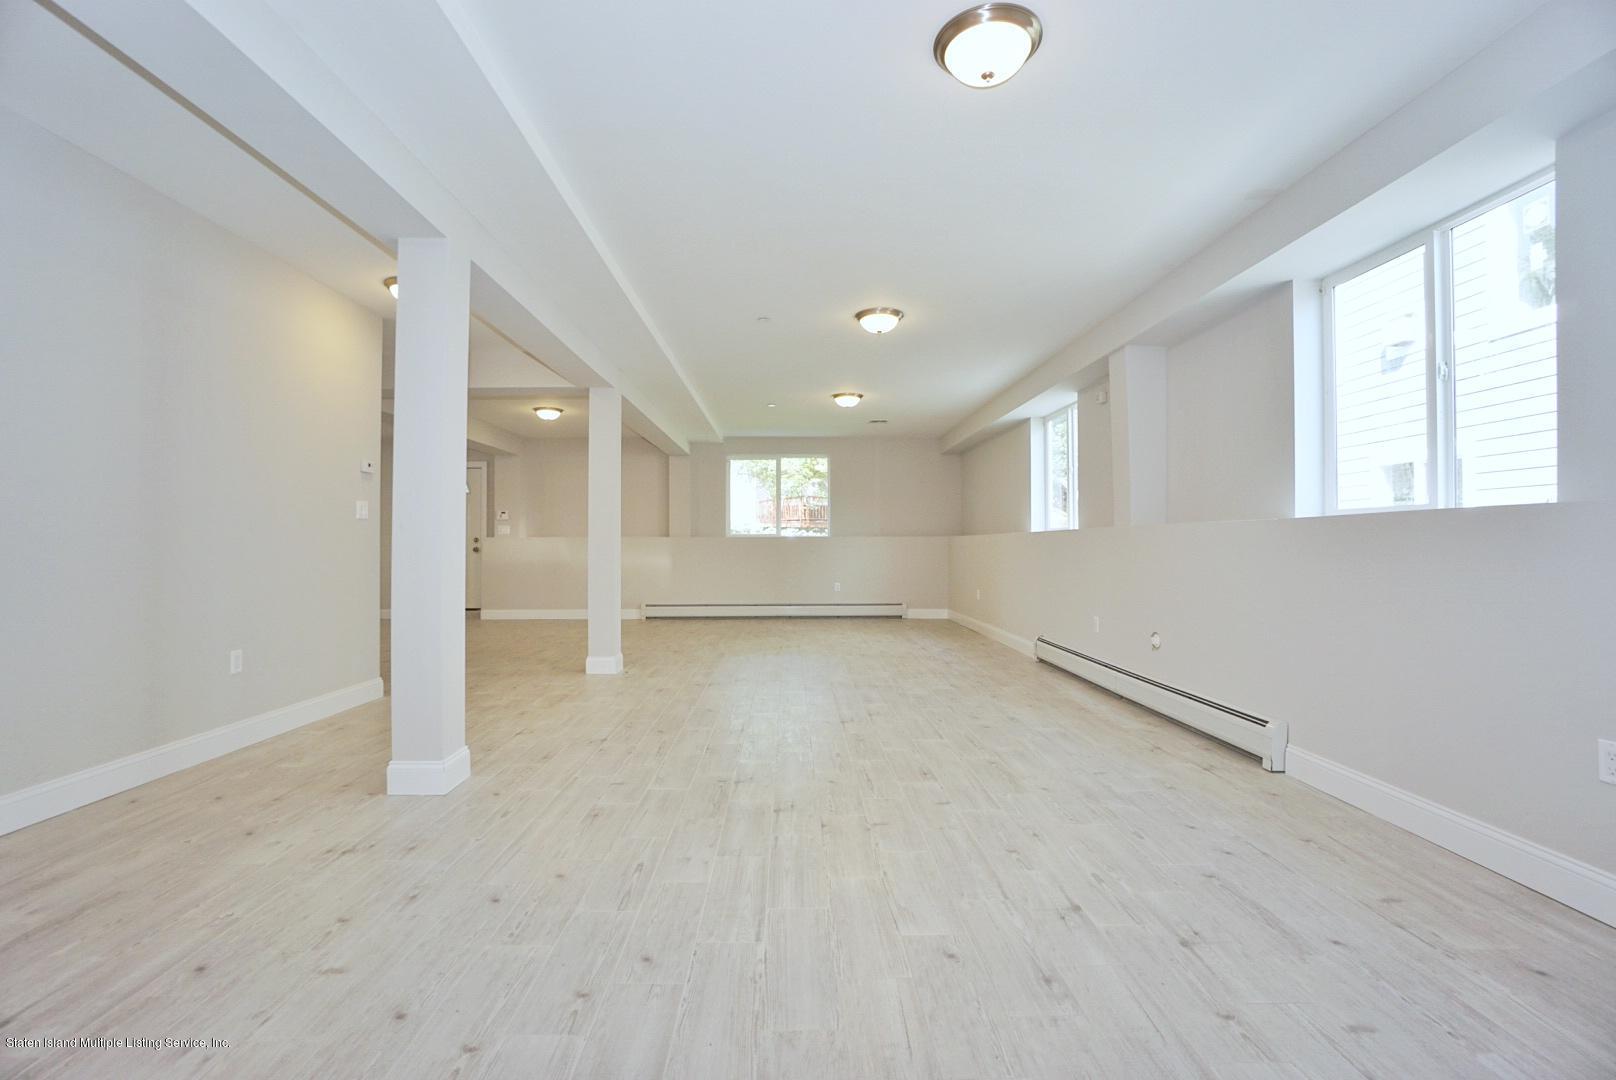 Single Family - Detached 170 Fairview Avenue  Staten Island, NY 10314, MLS-1126684-56